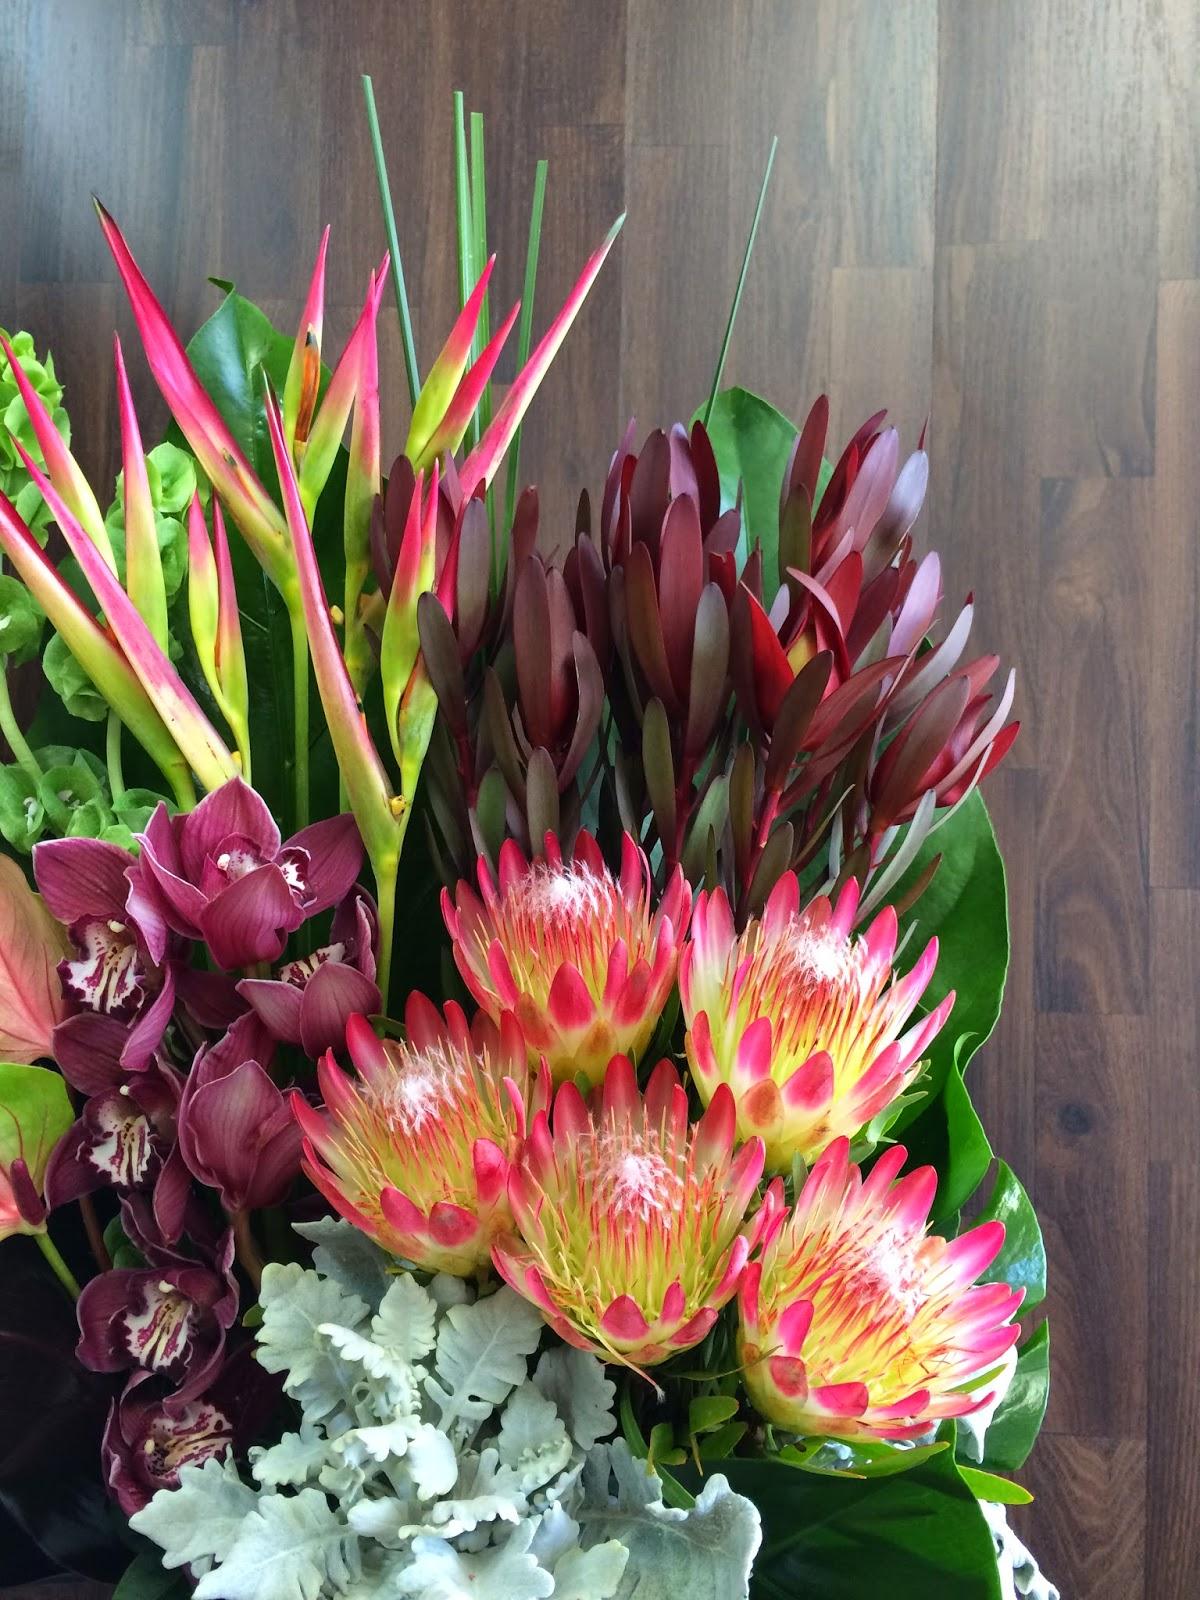 Urban Flower Australian Native Arrangements Church Worry Limp Wilting Floral